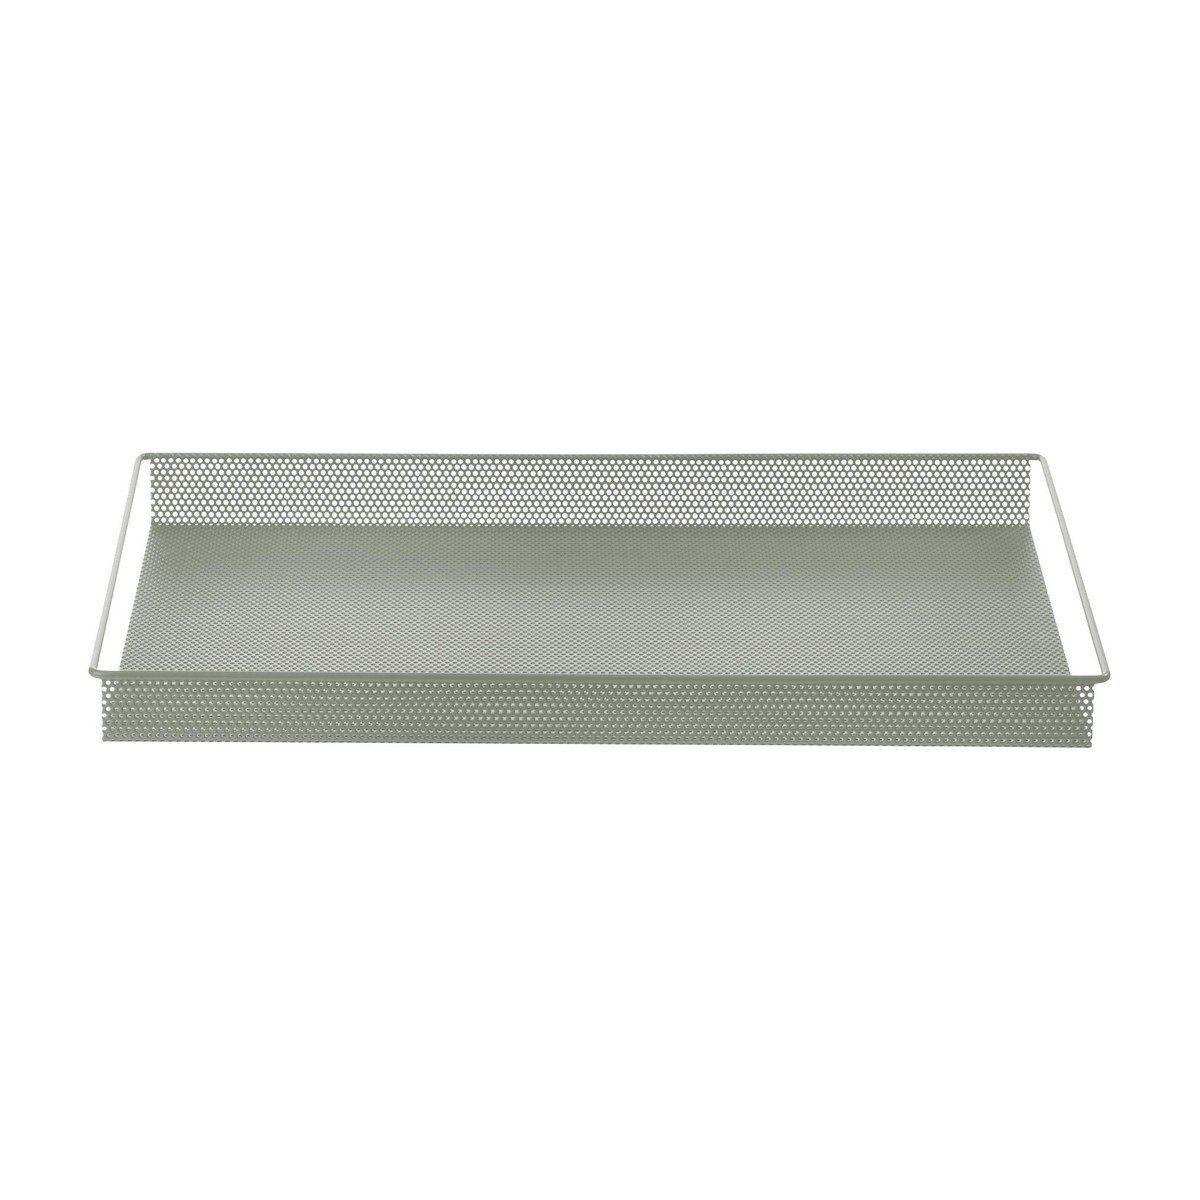 Tablett Groß metal tray ablage tablett groß ferm living ambientedirect com